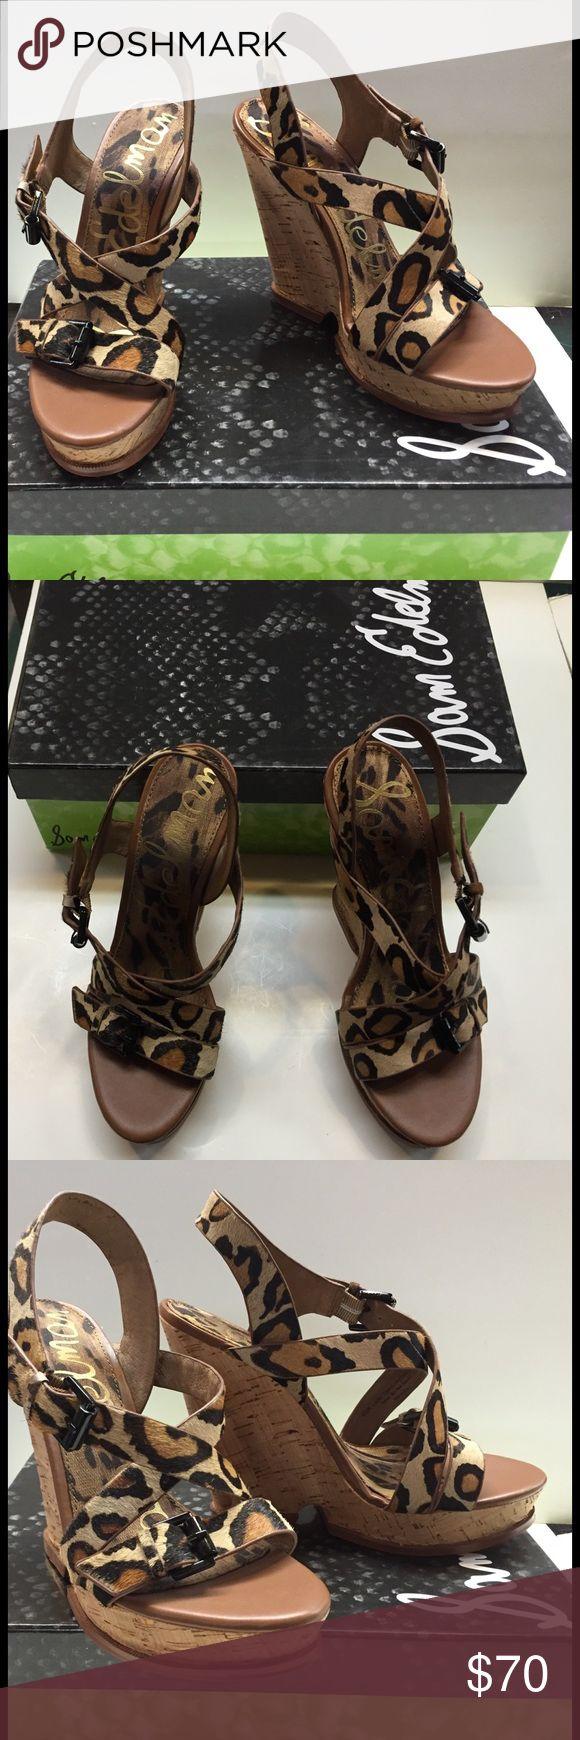 Sam Edelman Leopard print wedge. New. Sam Edelman Leopard print wedge sandals. Brand new in the box. Sam Edelman Shoes Wedges